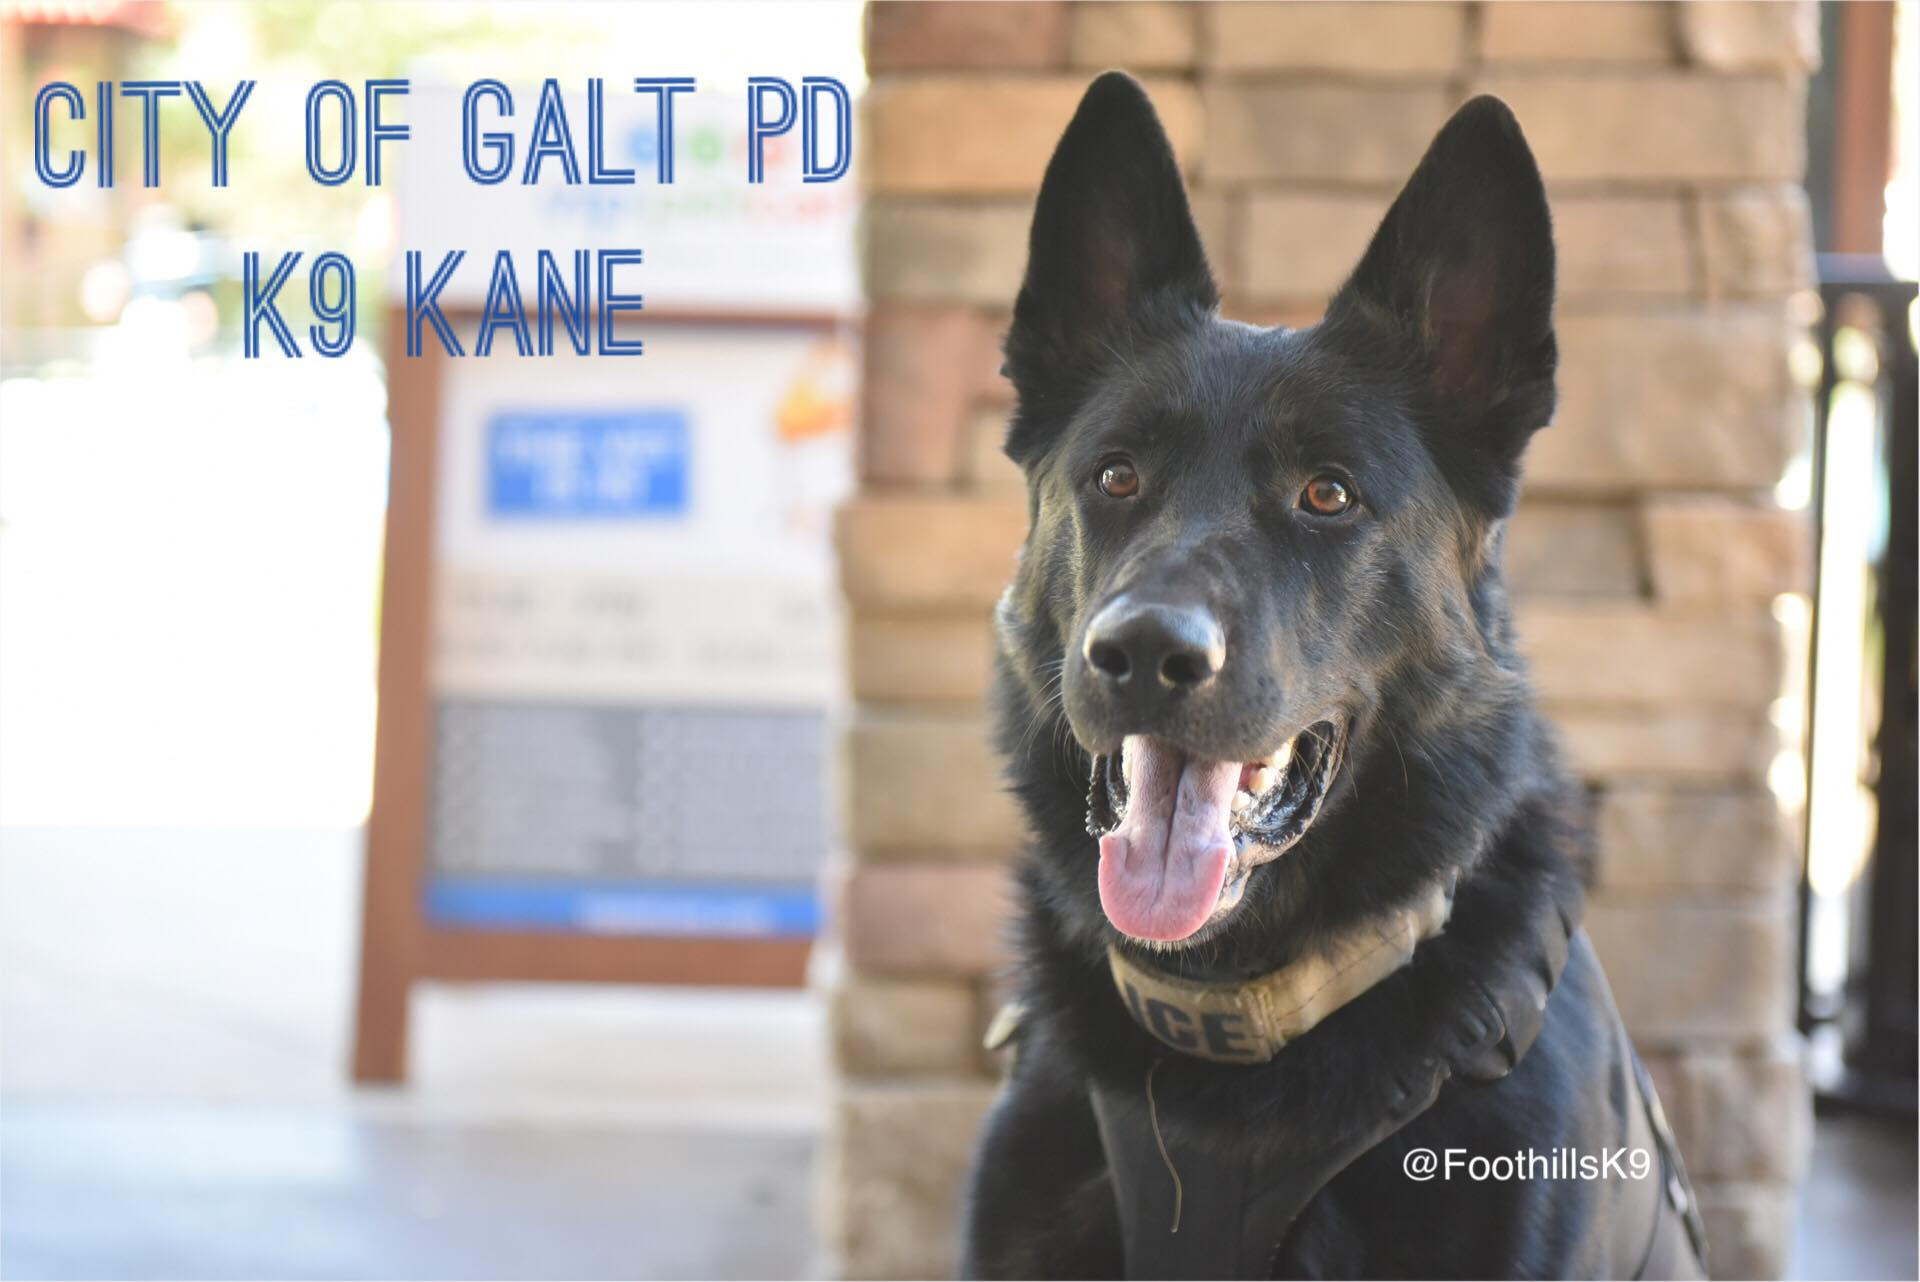 K9 Kane | New Protective Gear, Safer Days